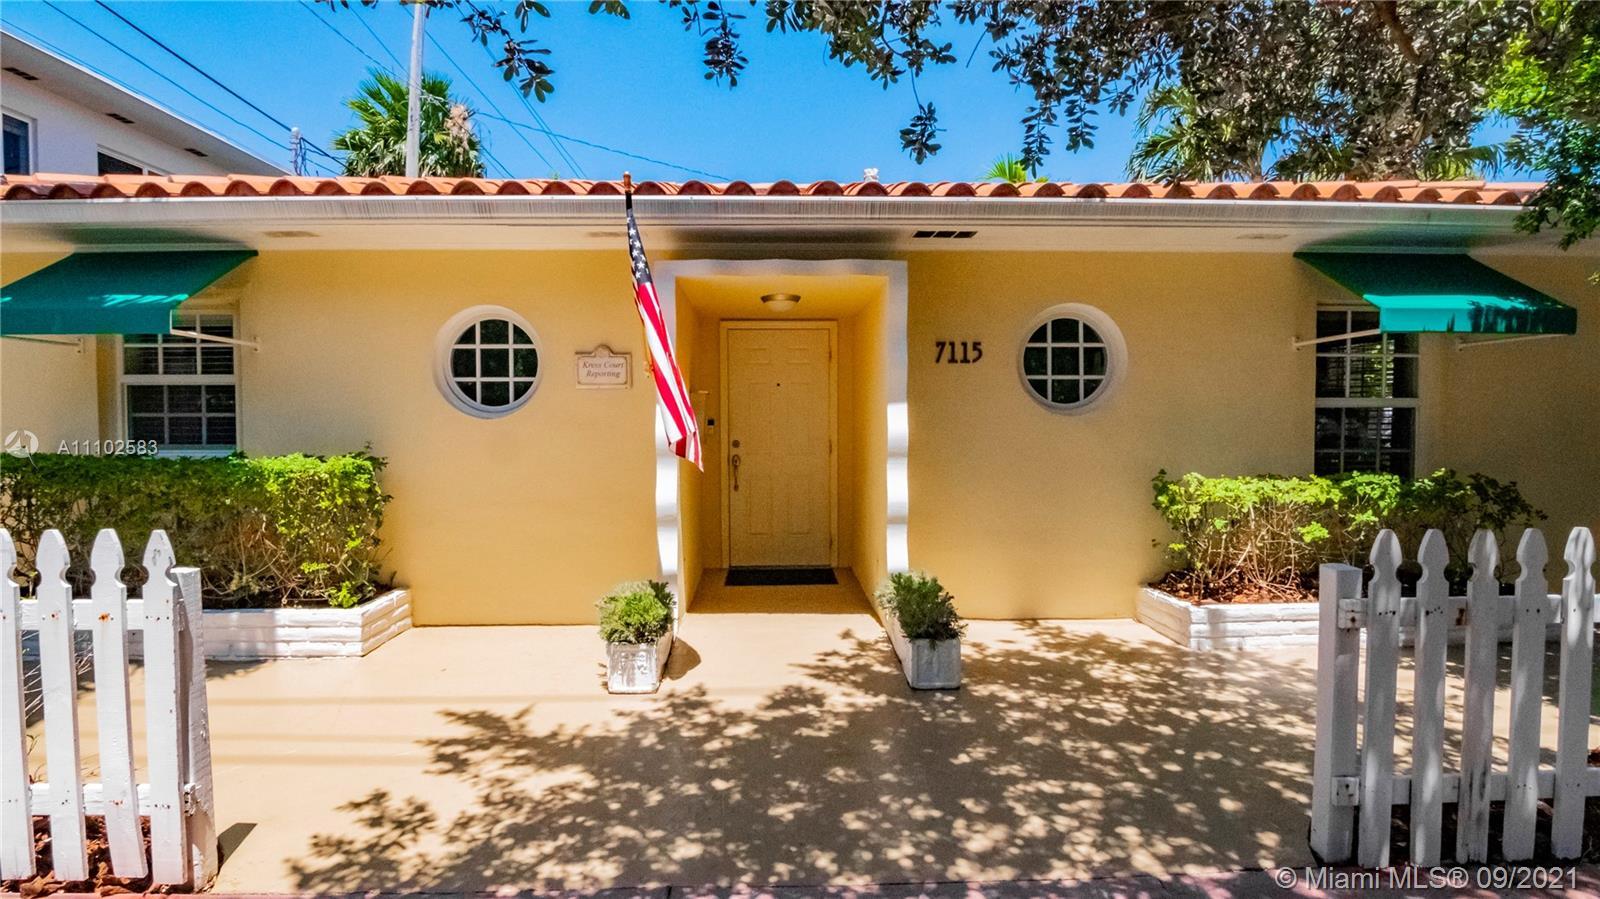 Single Family Home,For Sale,7115 Rue Notre Dame, Miami Beach, Florida 33141,Brickell,realty,broker,condos near me